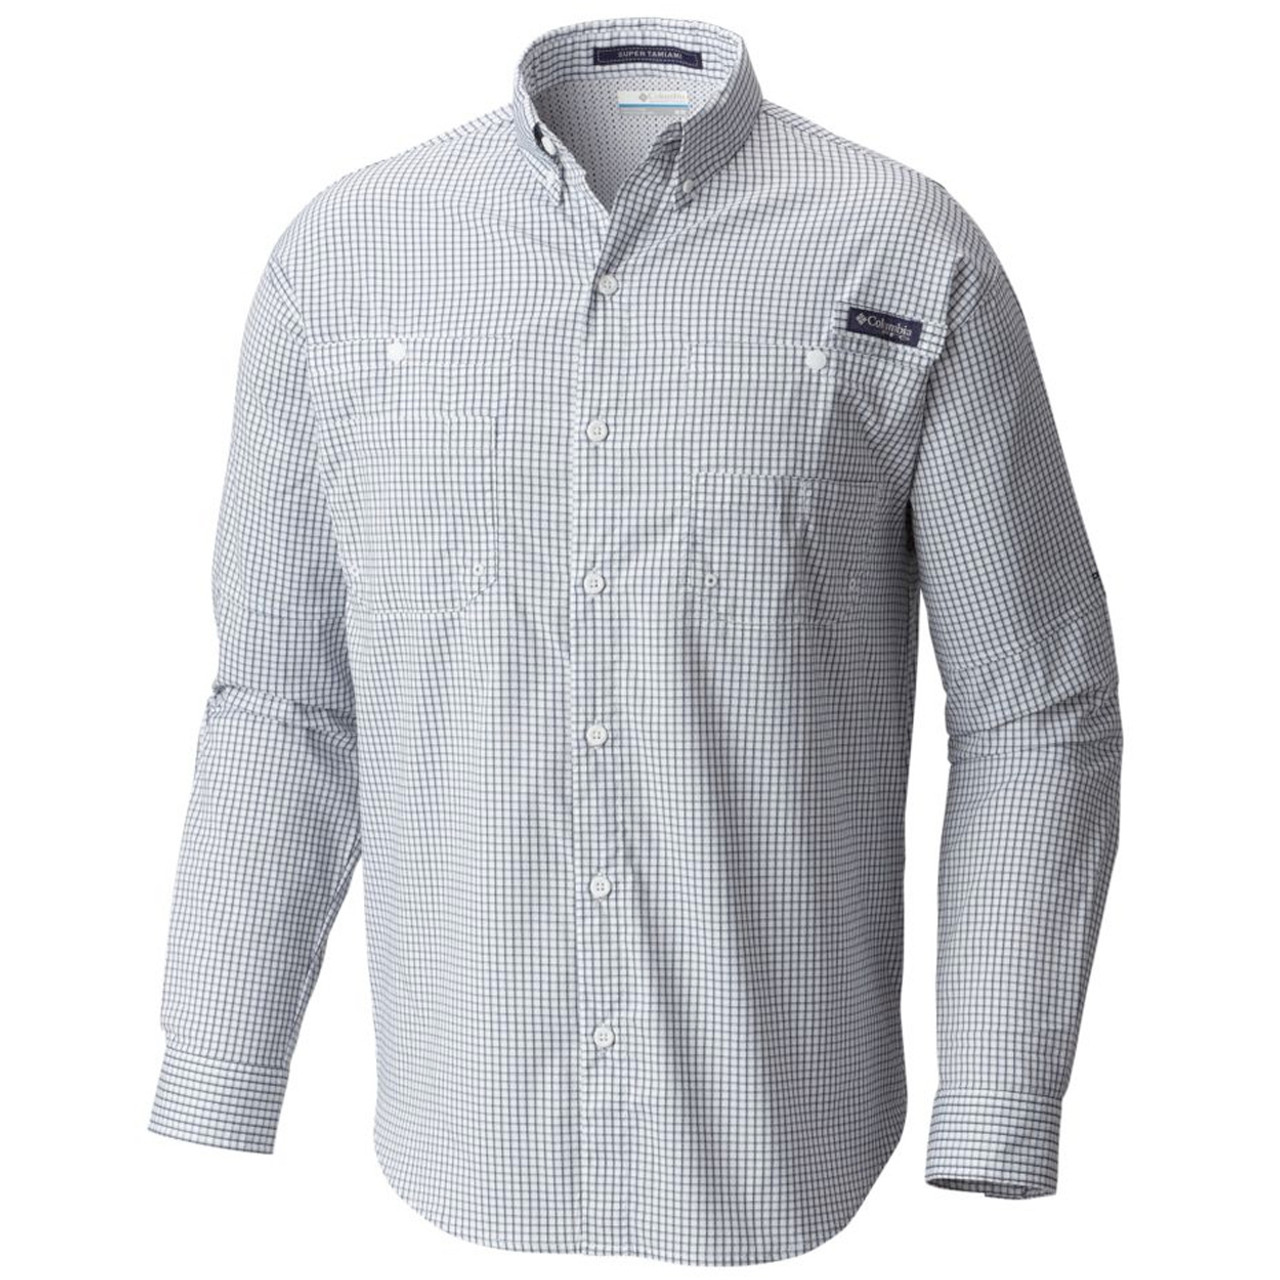 f885afed067 Columbia Sportswear Men's PFG Super Tamiami Longsleeve Shirt - GolfEtail.com